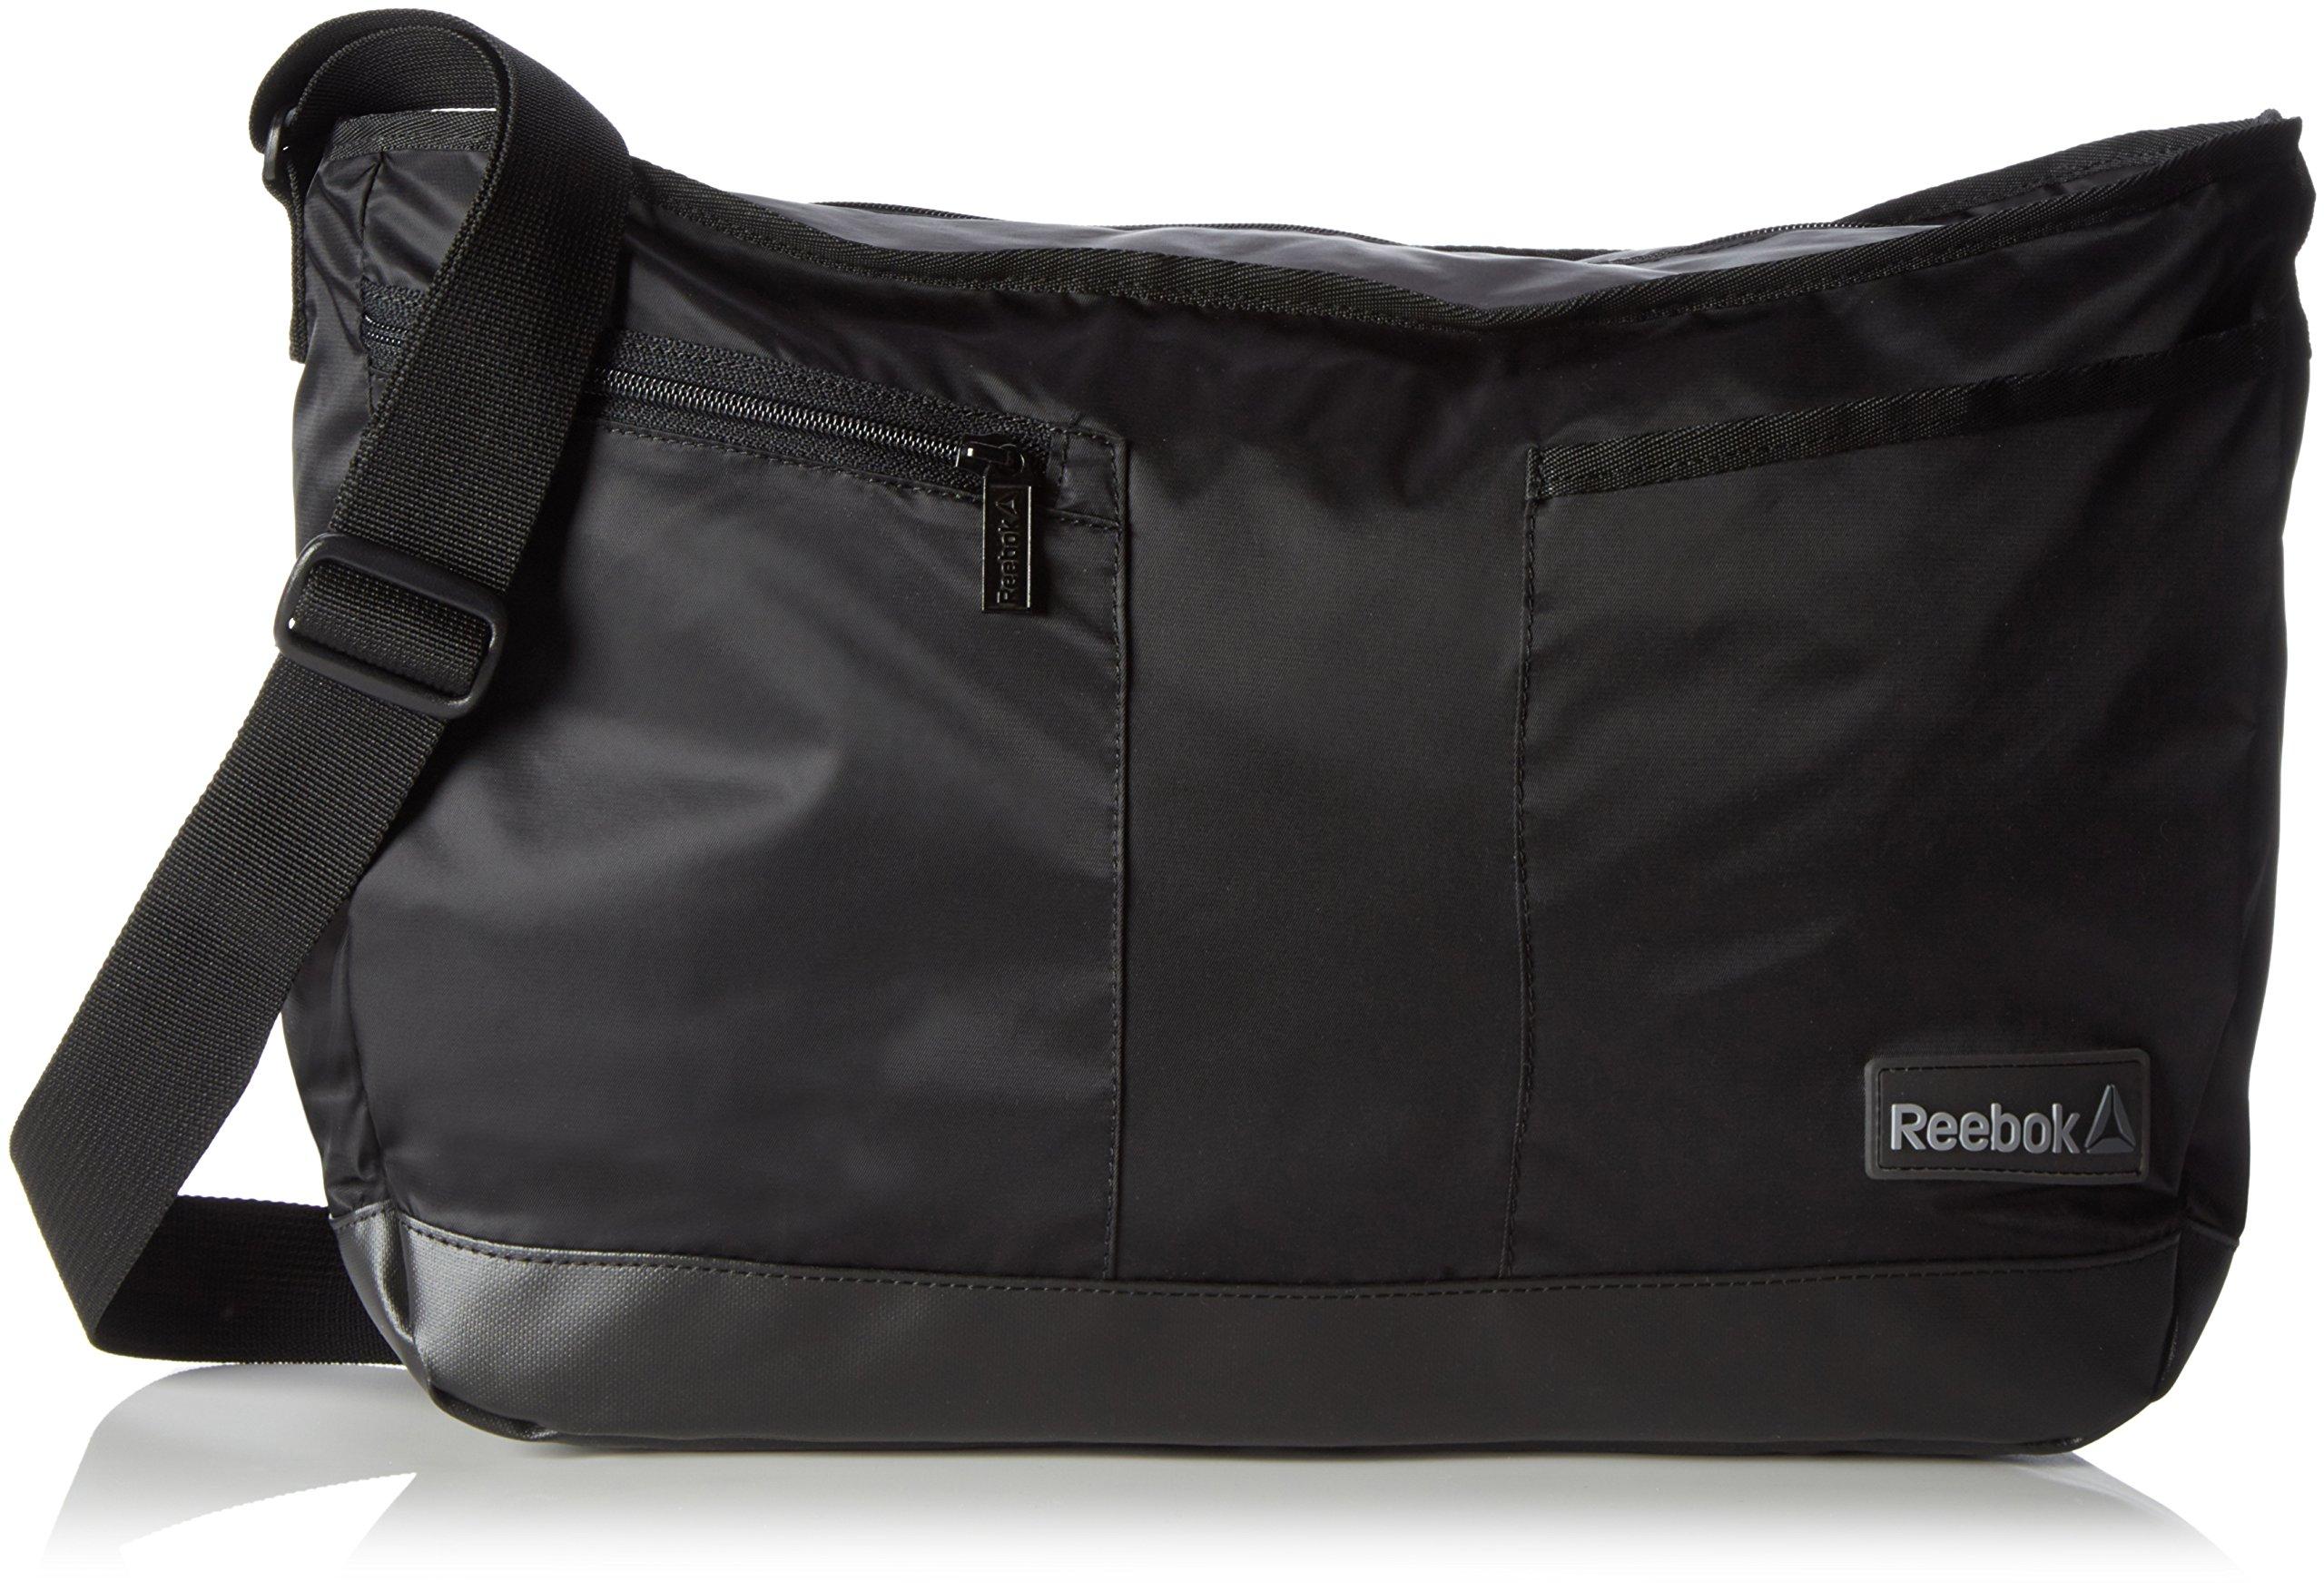 Reebok Womens AJ6174 Bag, Black, One Size